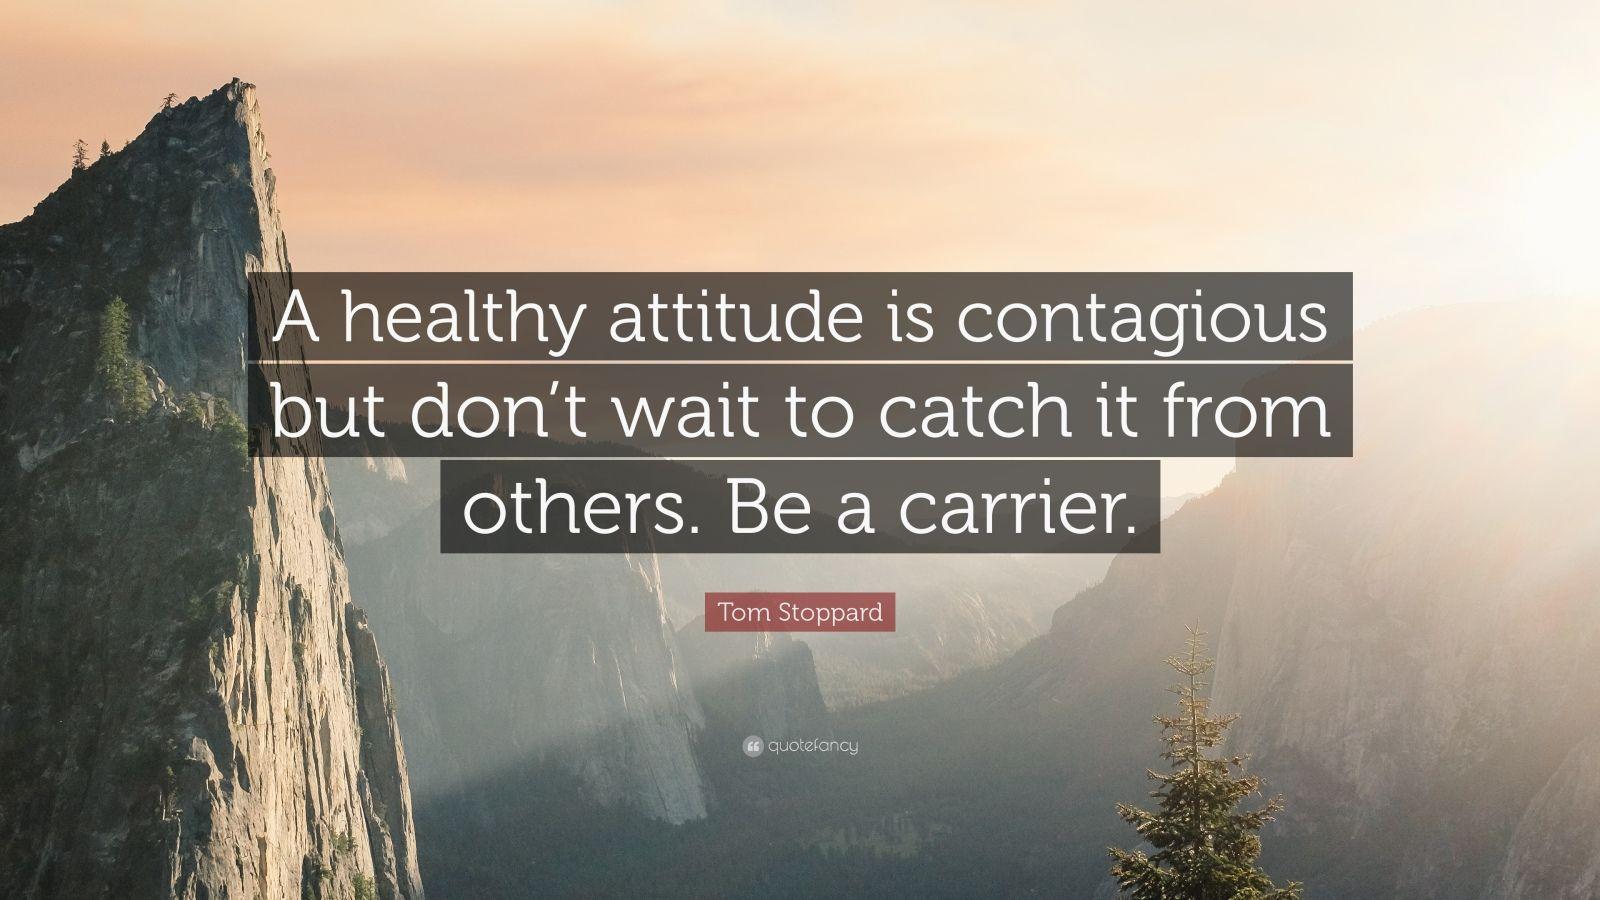 And positive attitude